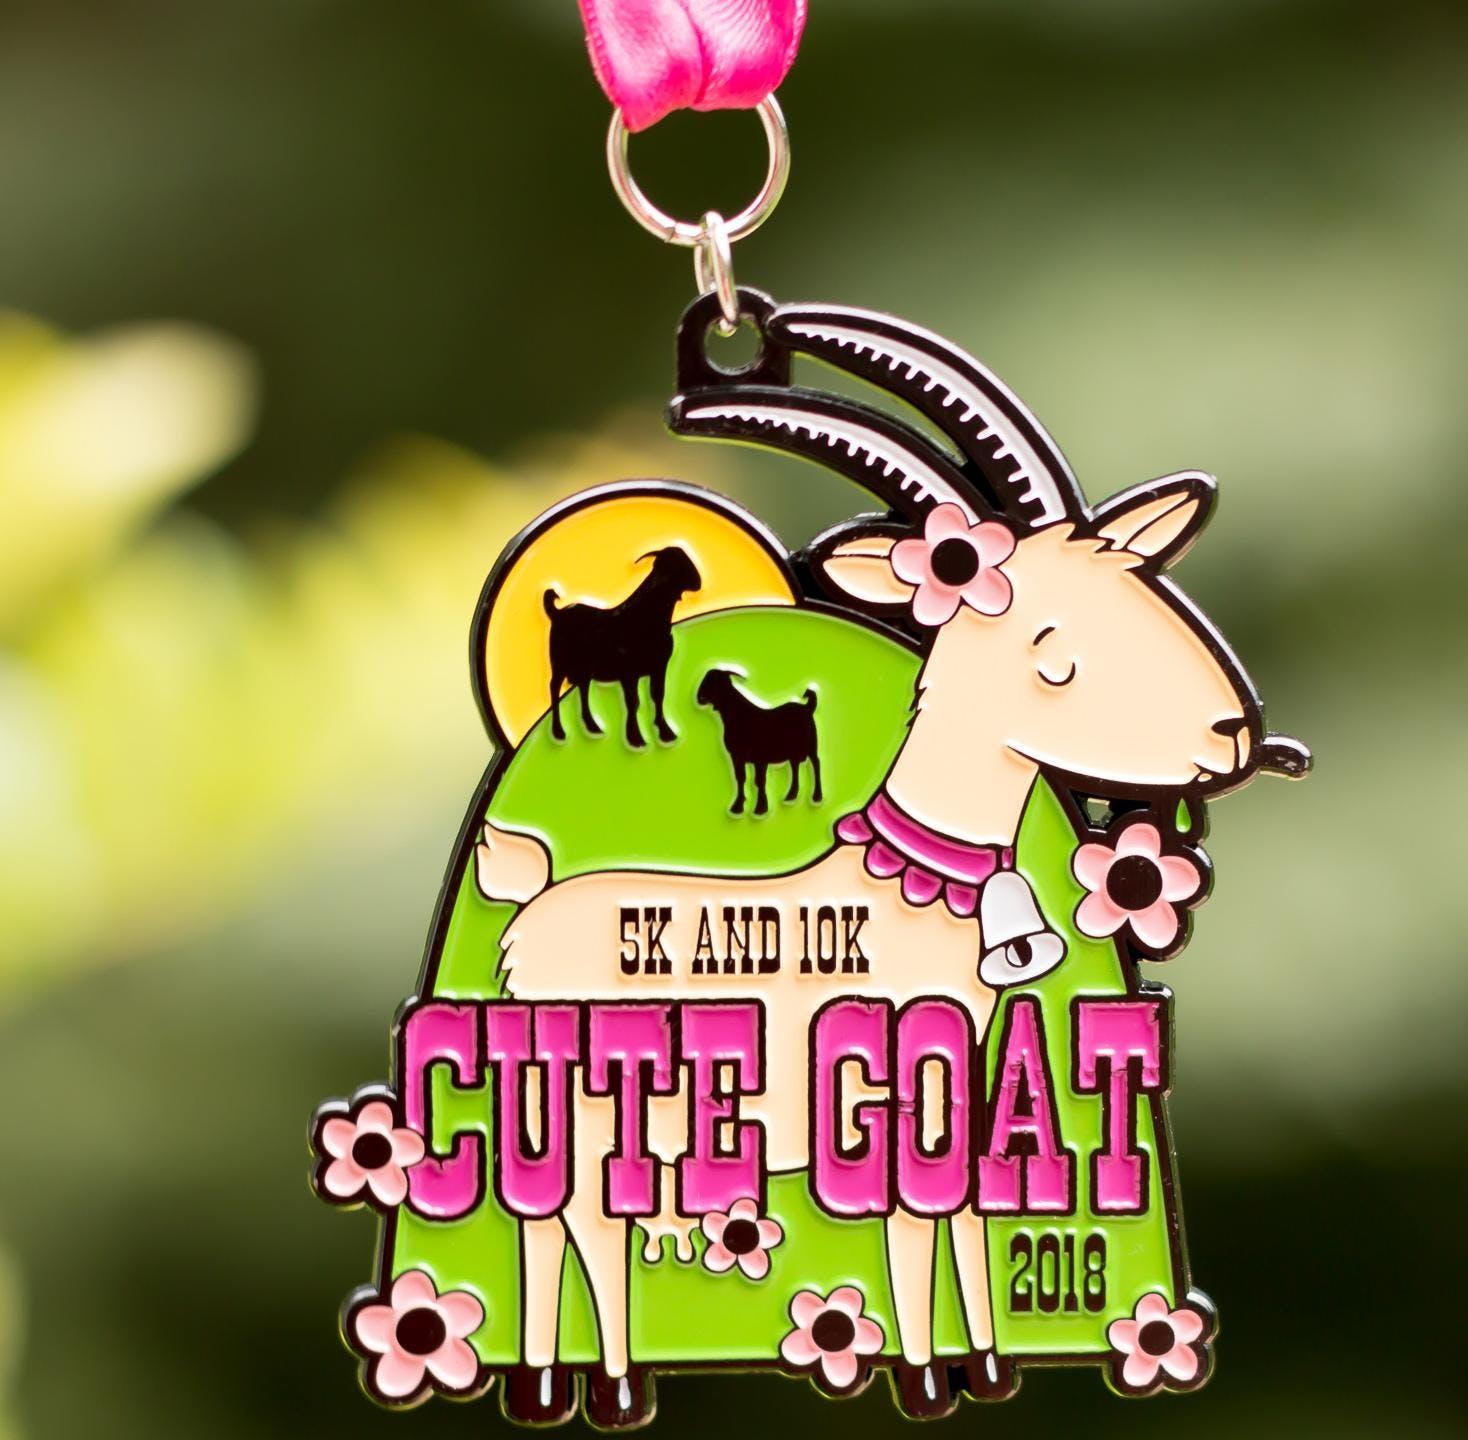 Now Only $10! Cute Goat 5K & 10K - Richmond